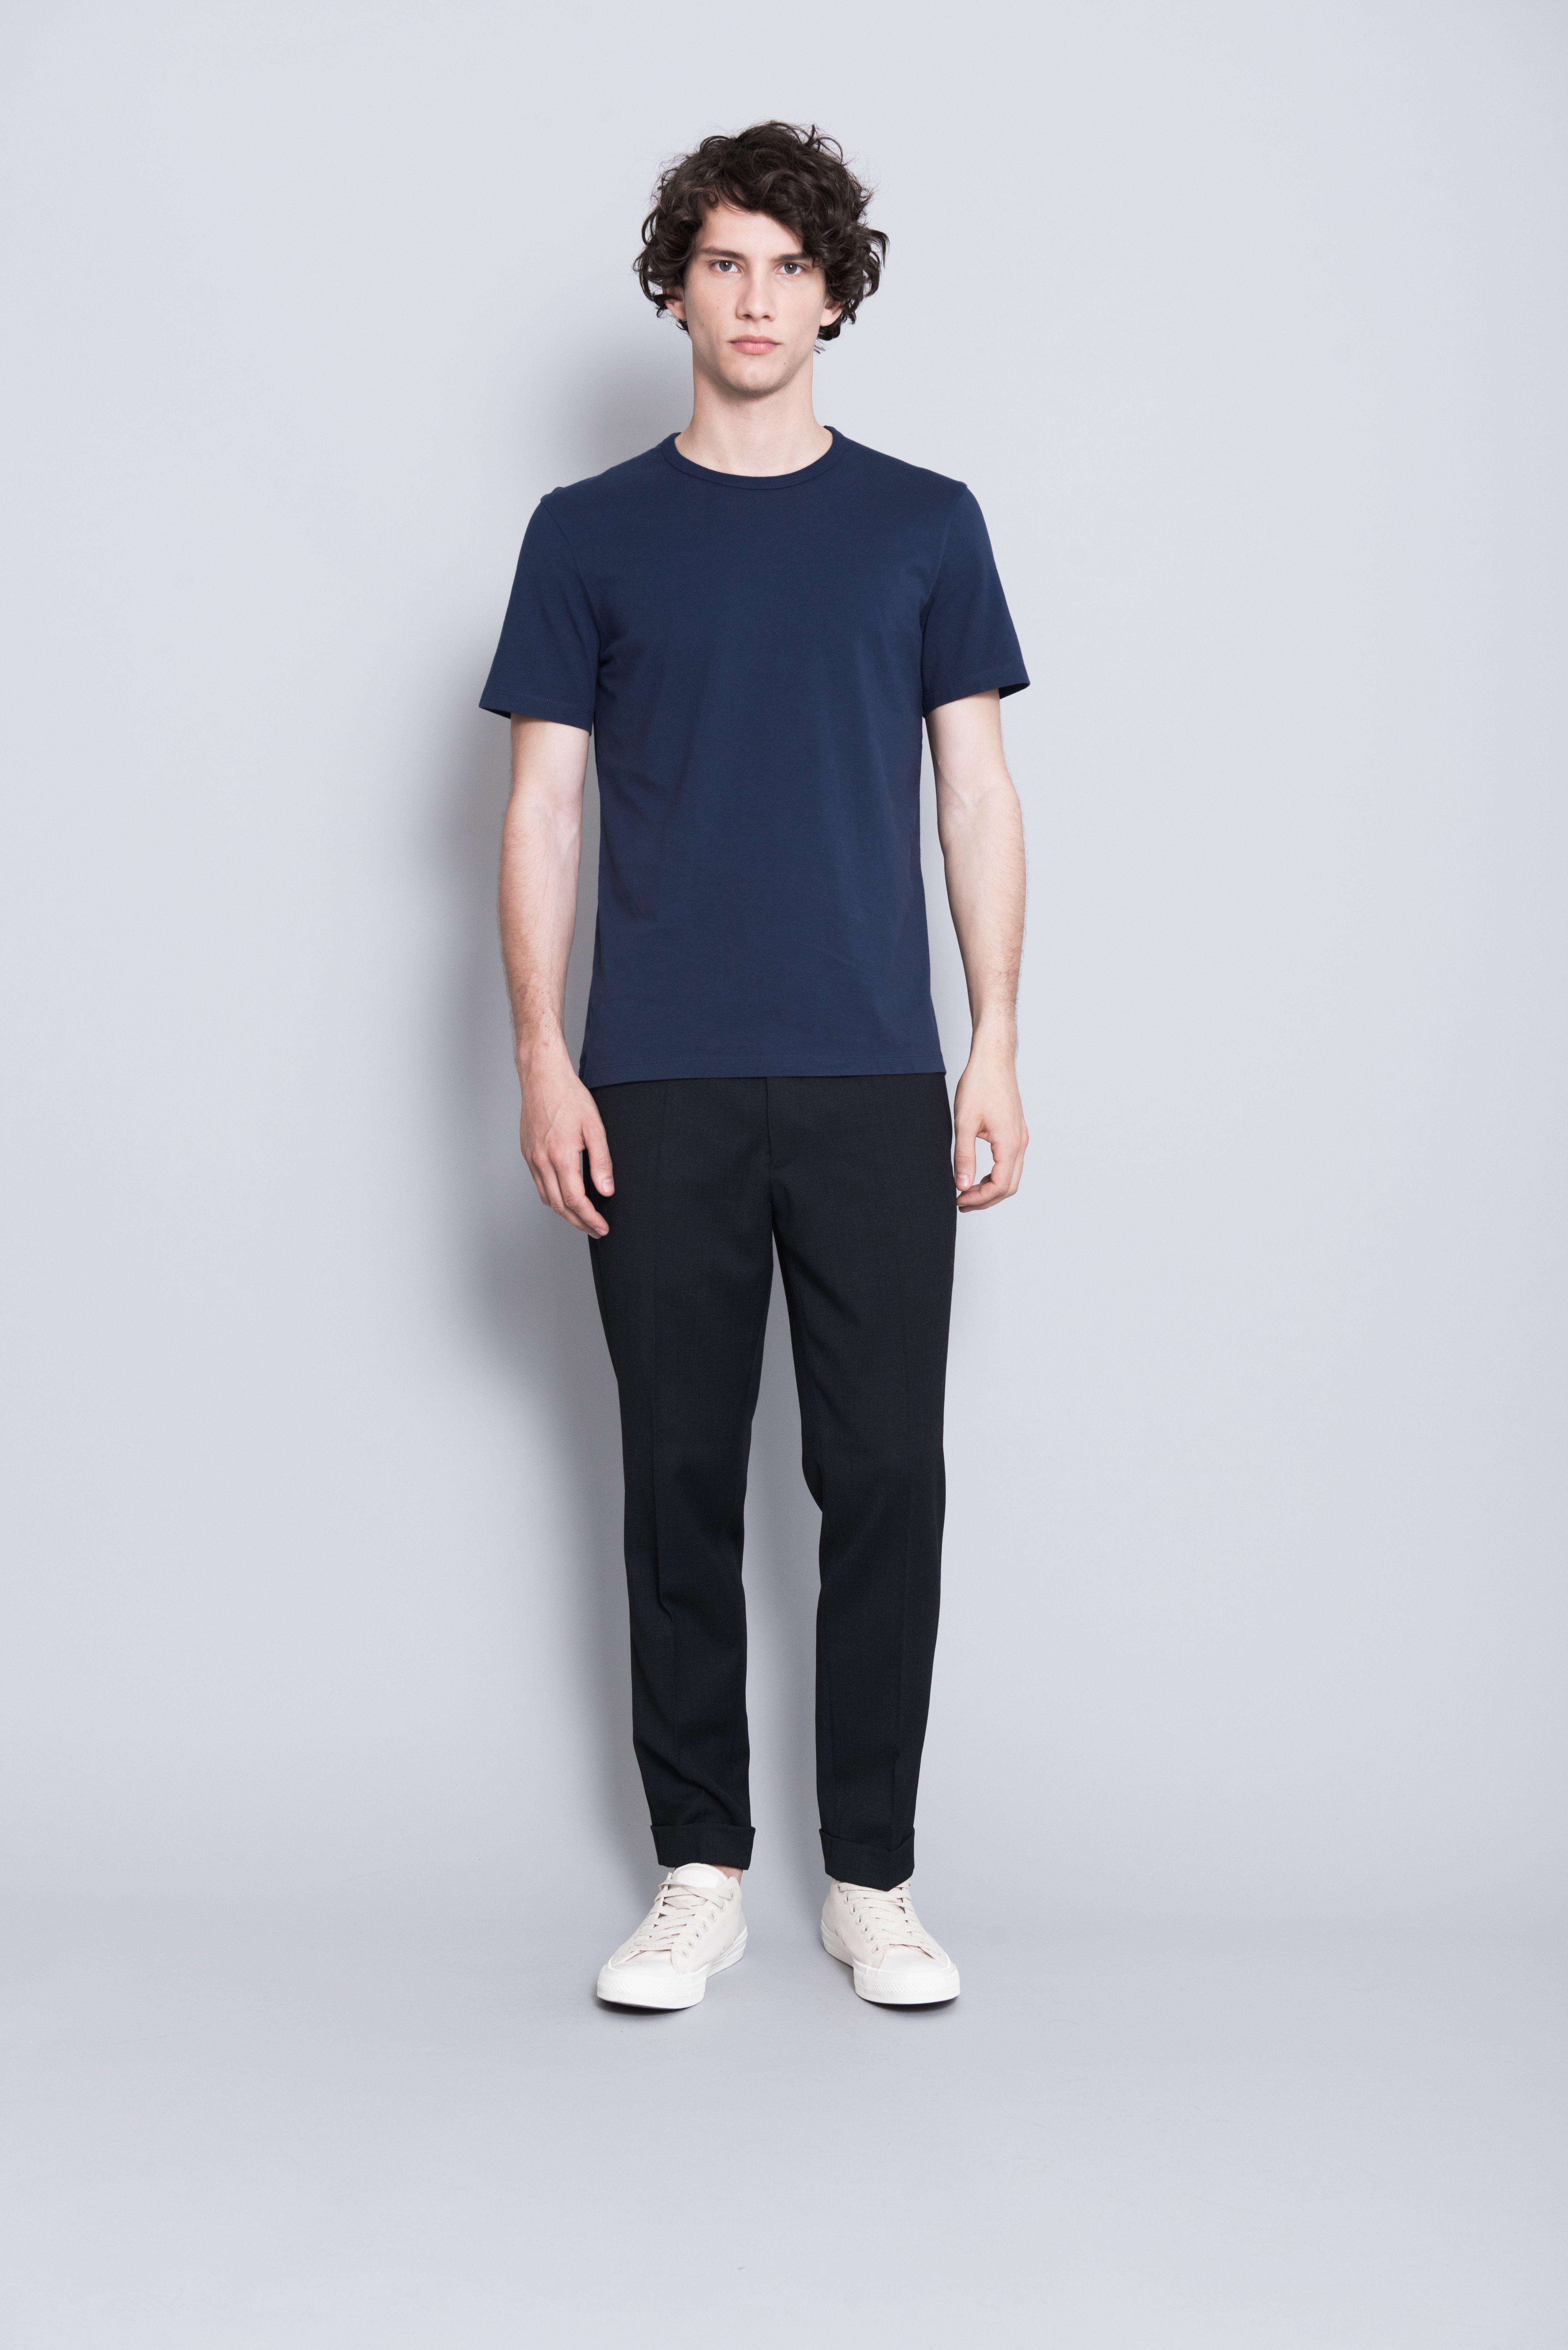 Danny zuko black t shirt - The Asket T Shirt In Navy Blue Asket